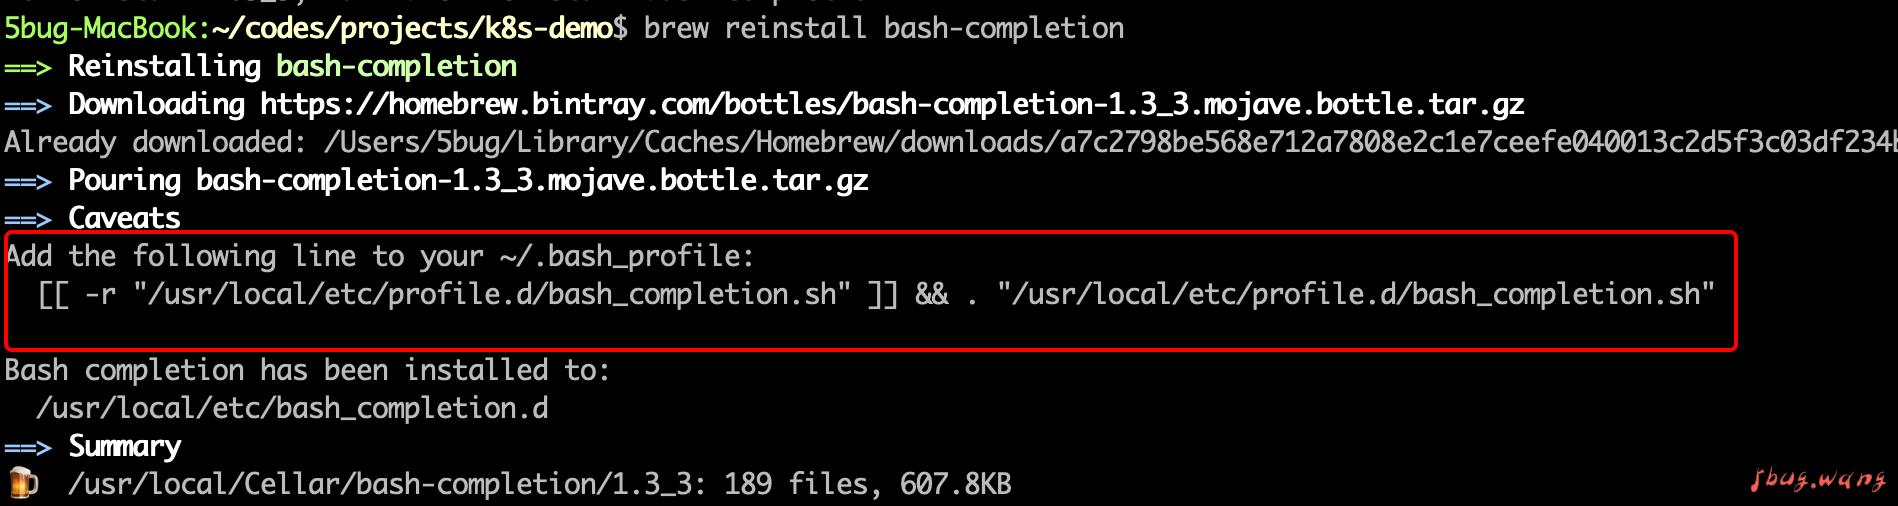 macOs和Linux环境下kubectl命令自动补齐的方法